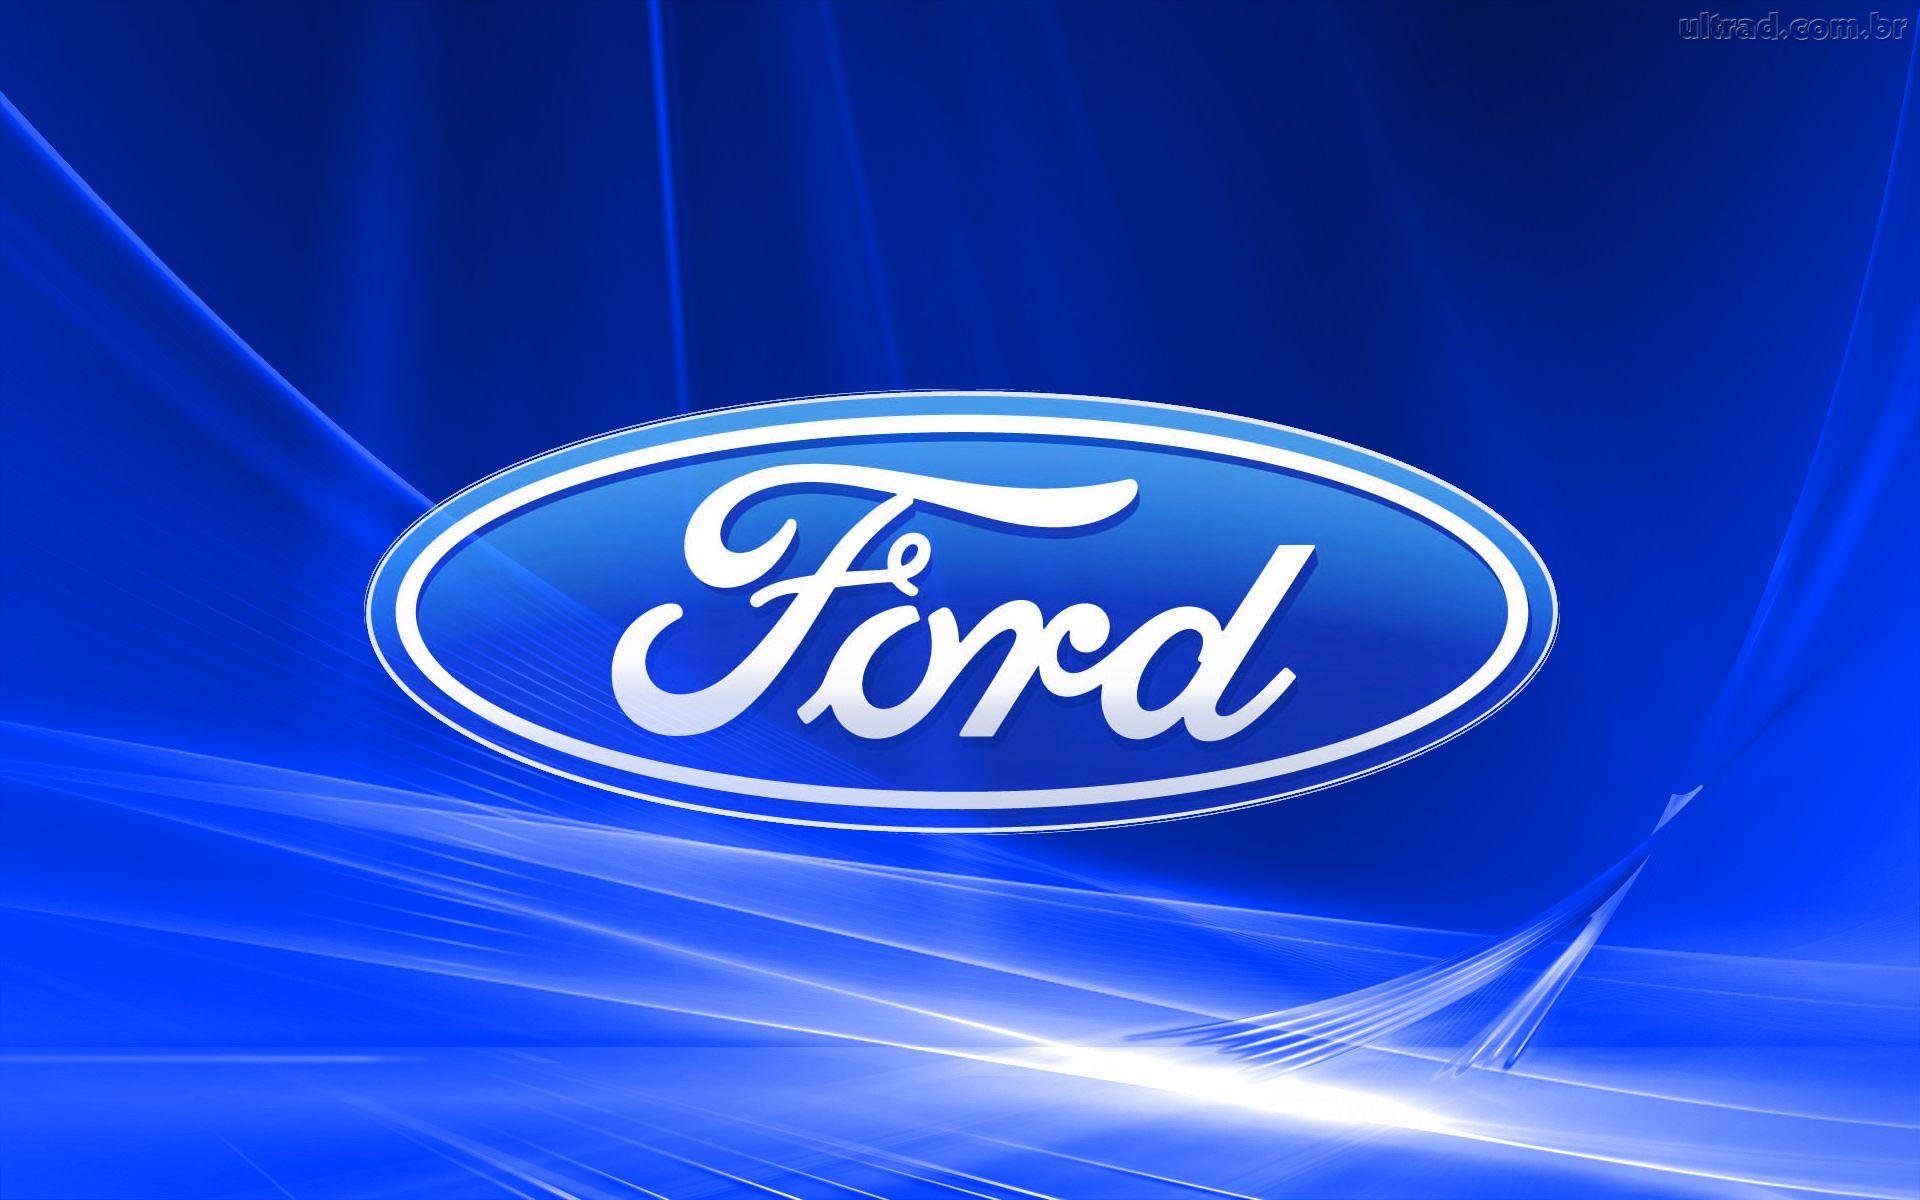 Ford Logo Wallpaper 10330 Wallpapers HD colourinwallpaper 1920x1200